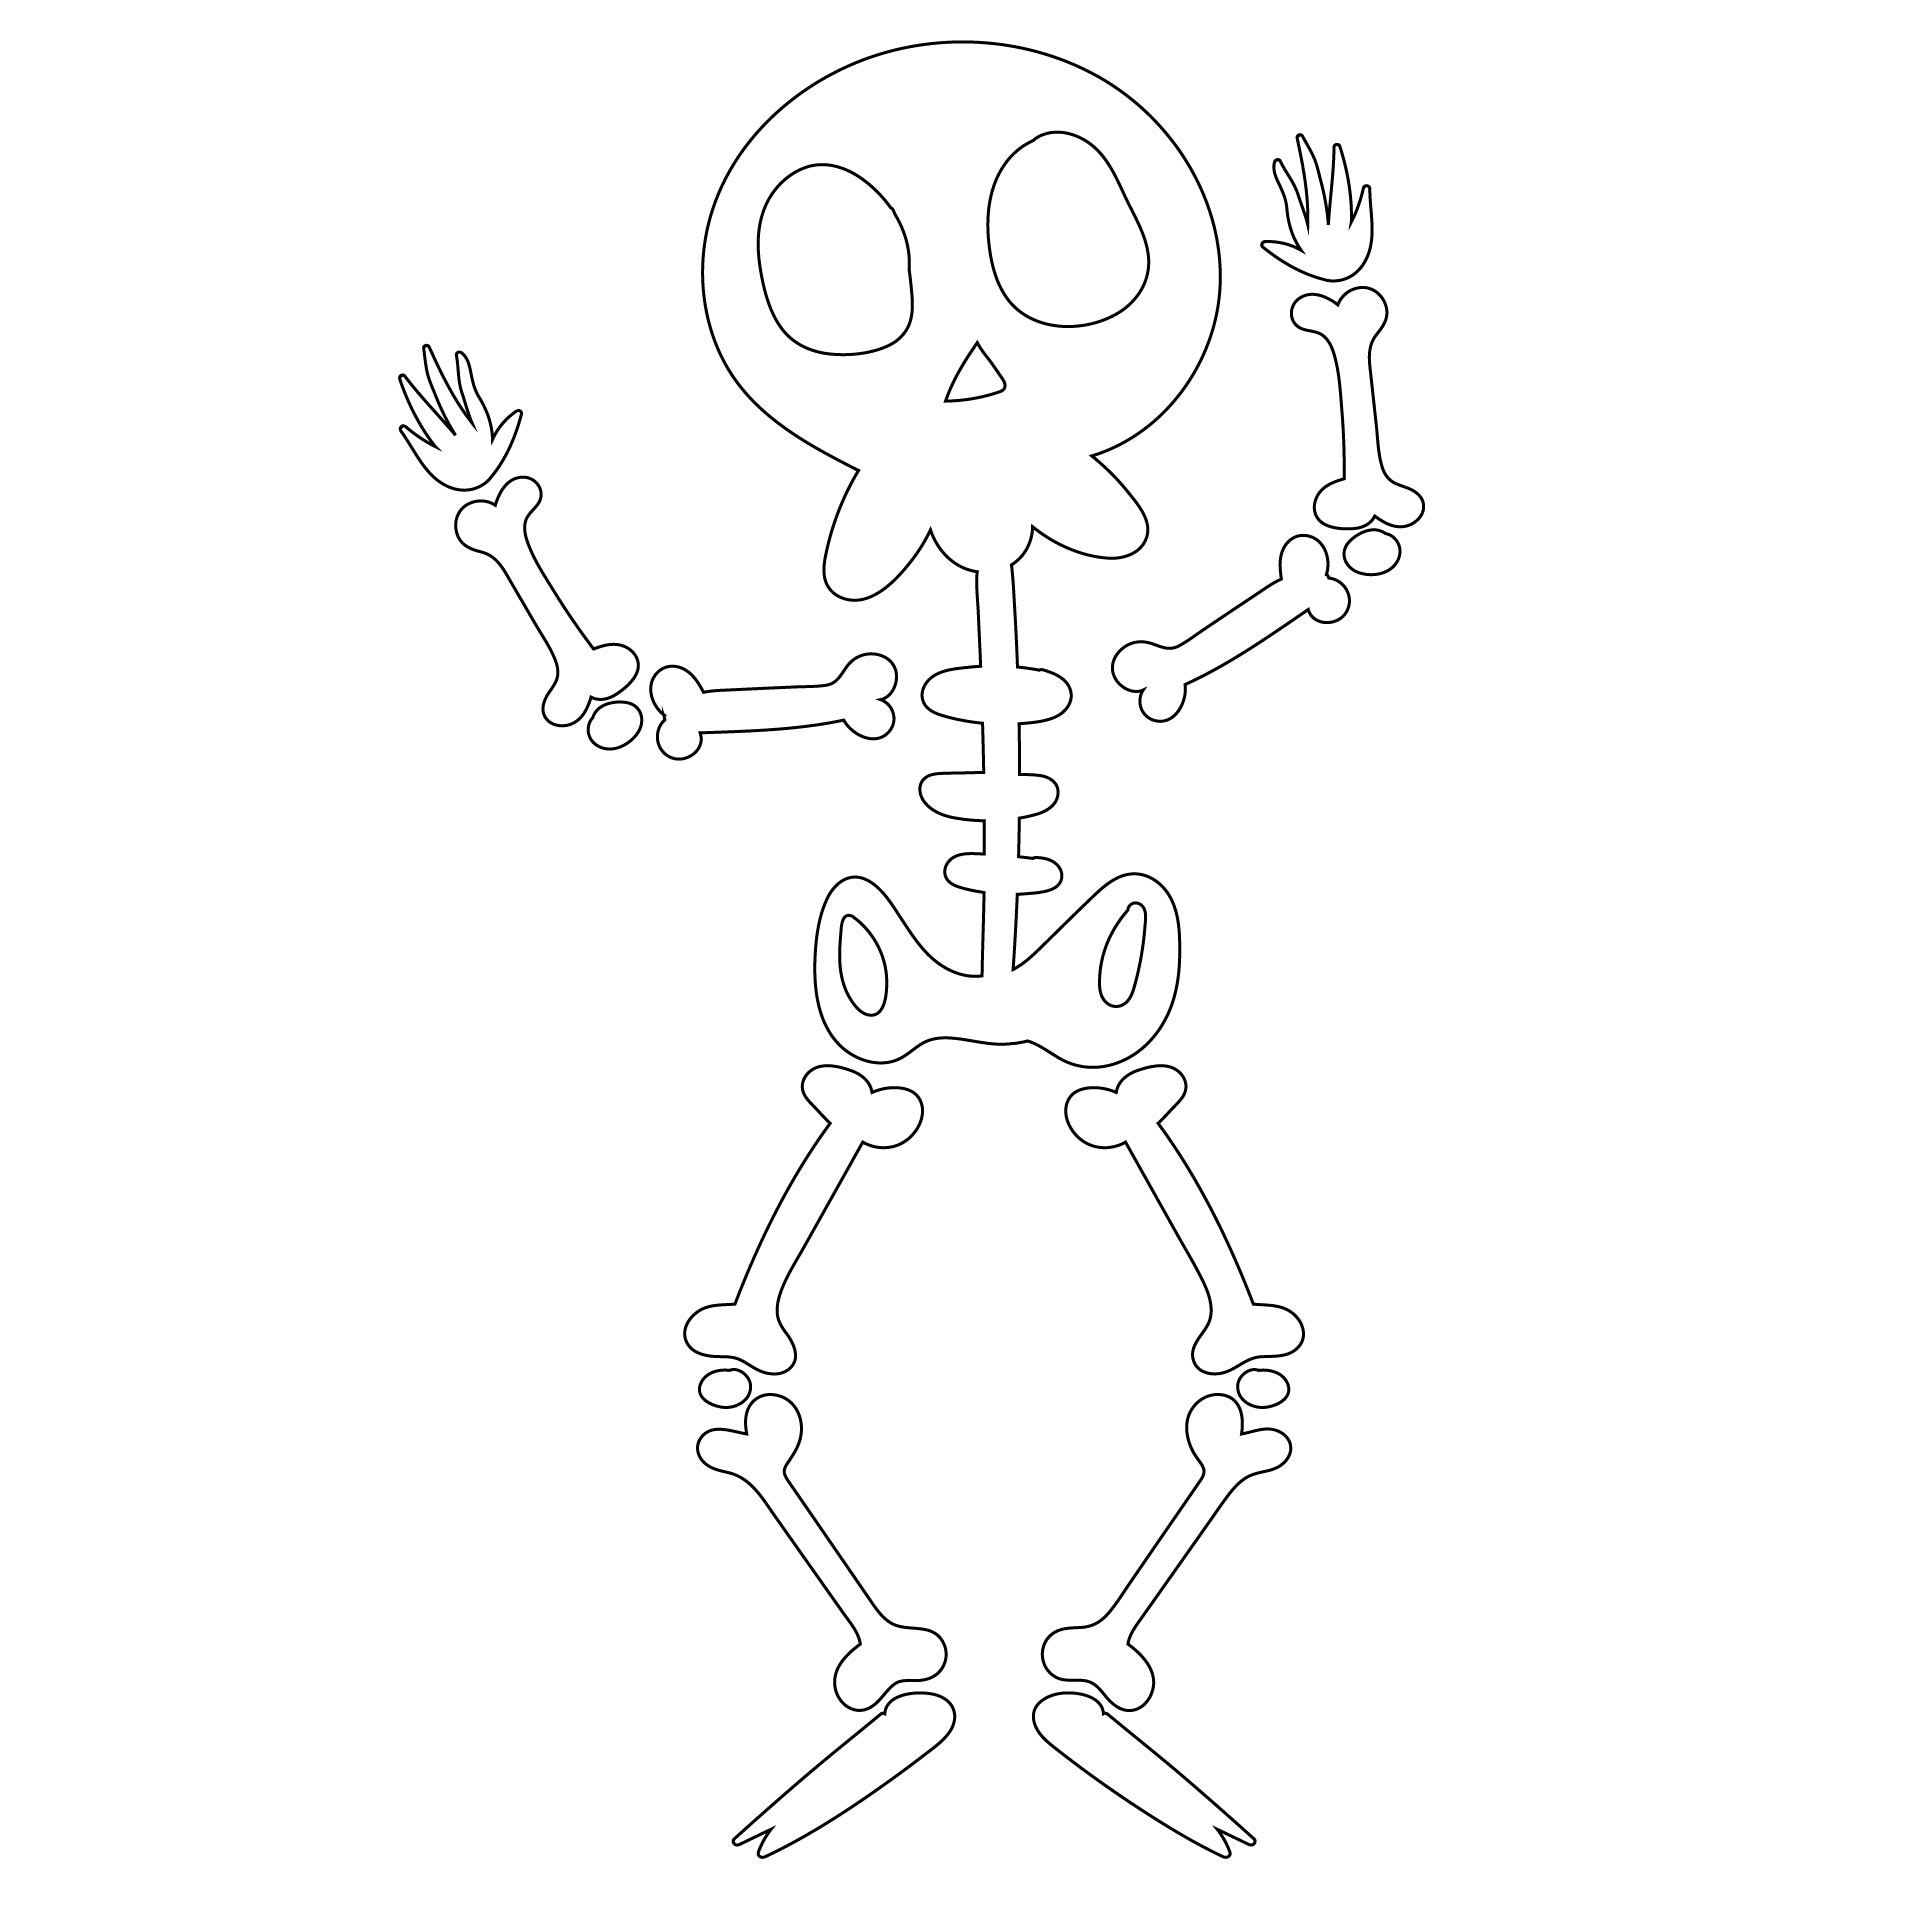 Printable Halloween Skeleton Game